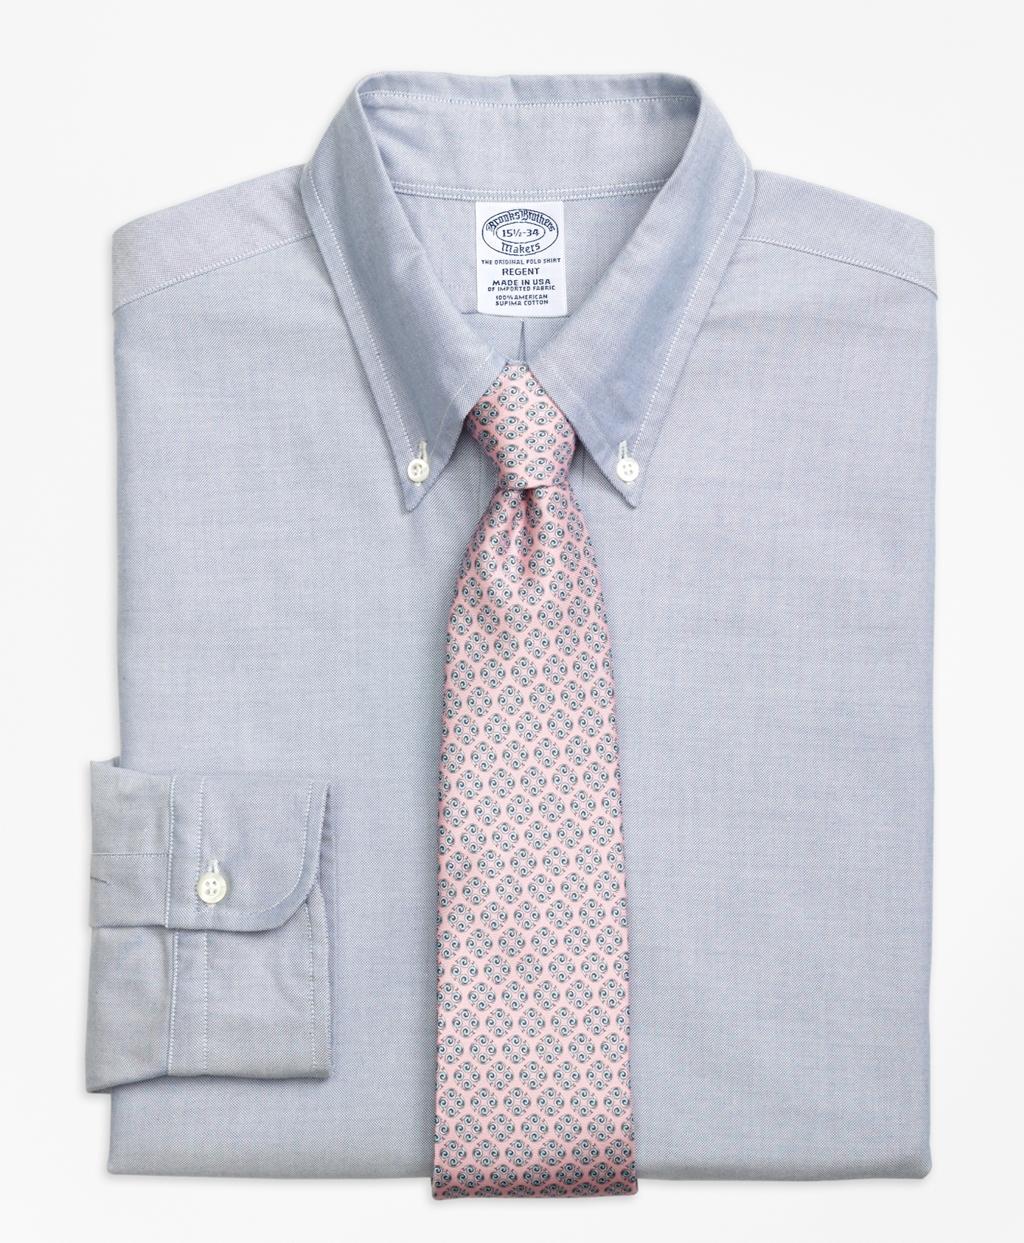 7f1f4d60ba74 Original Polo® Button-Down Oxford Regent Fitted Dress Shirt - Brooks ...